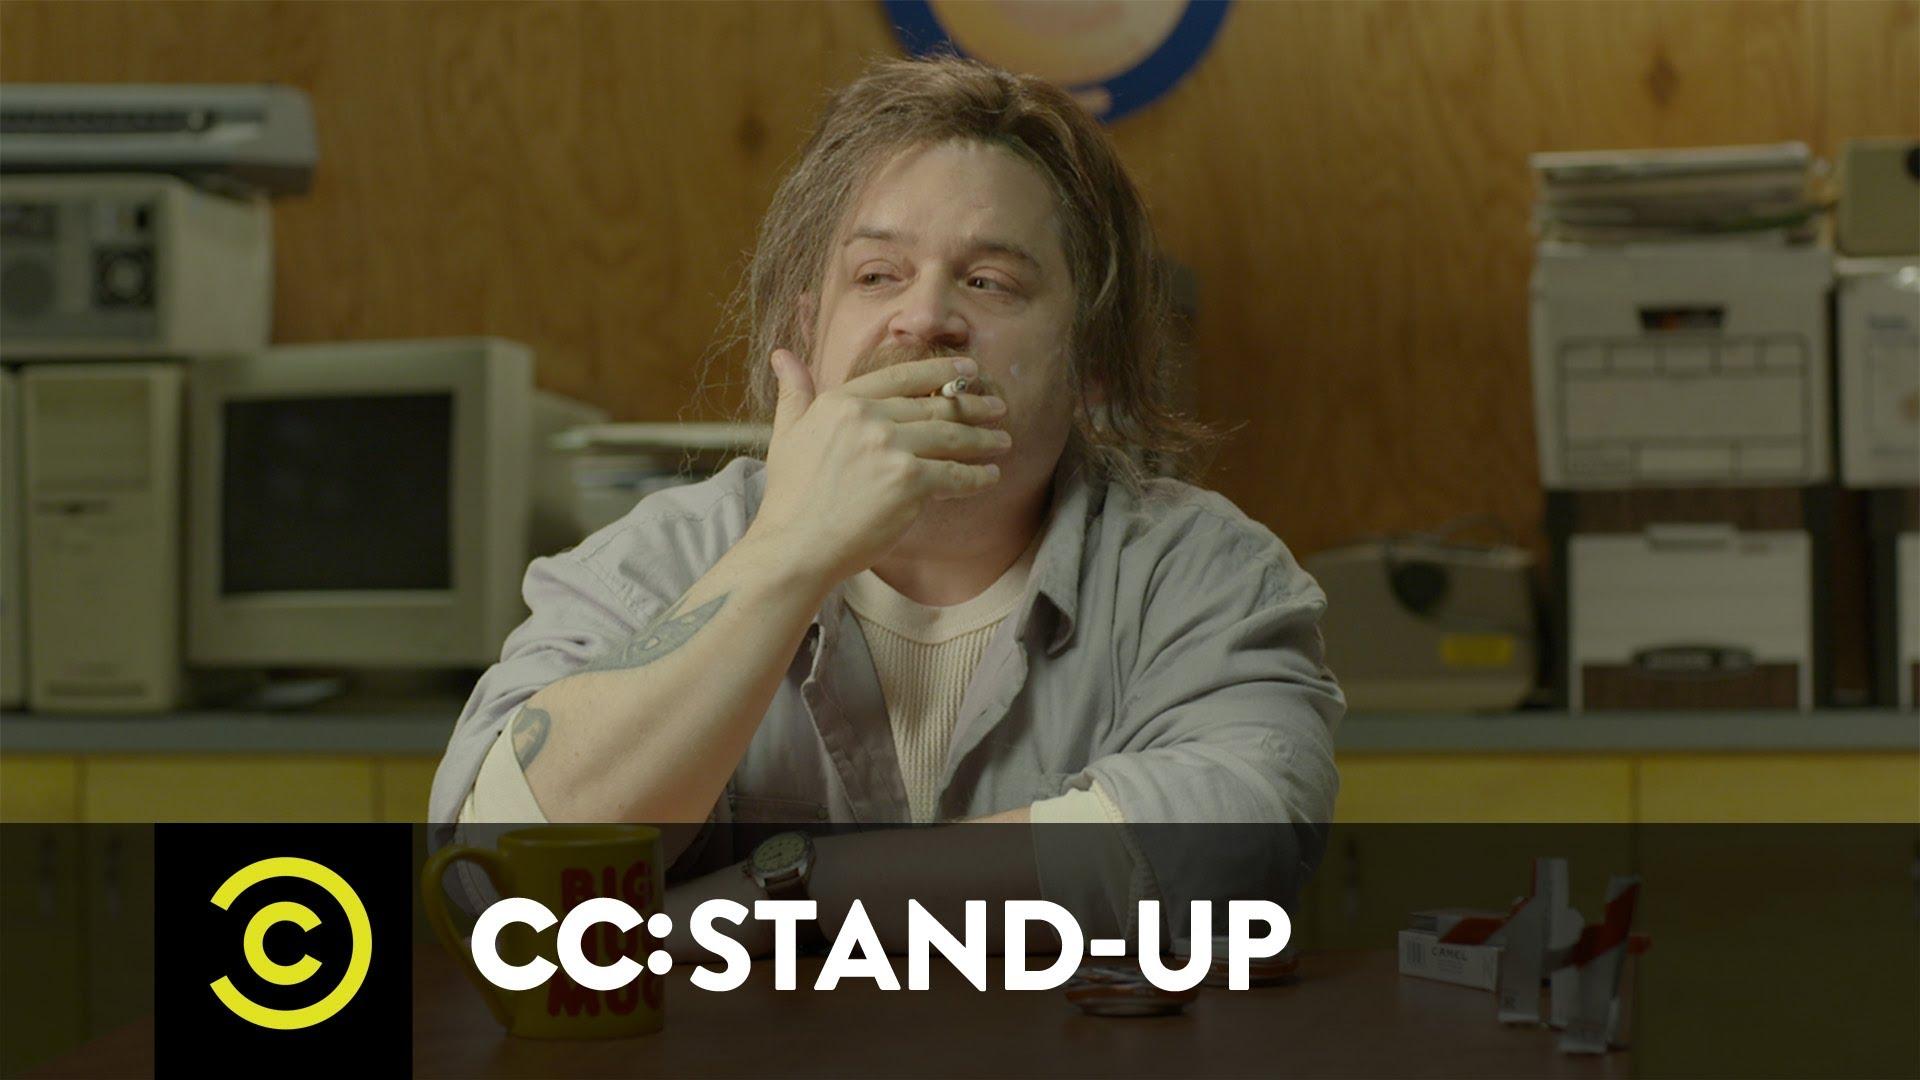 Patton Oswalt Parodies Rust Cohle From True Detective